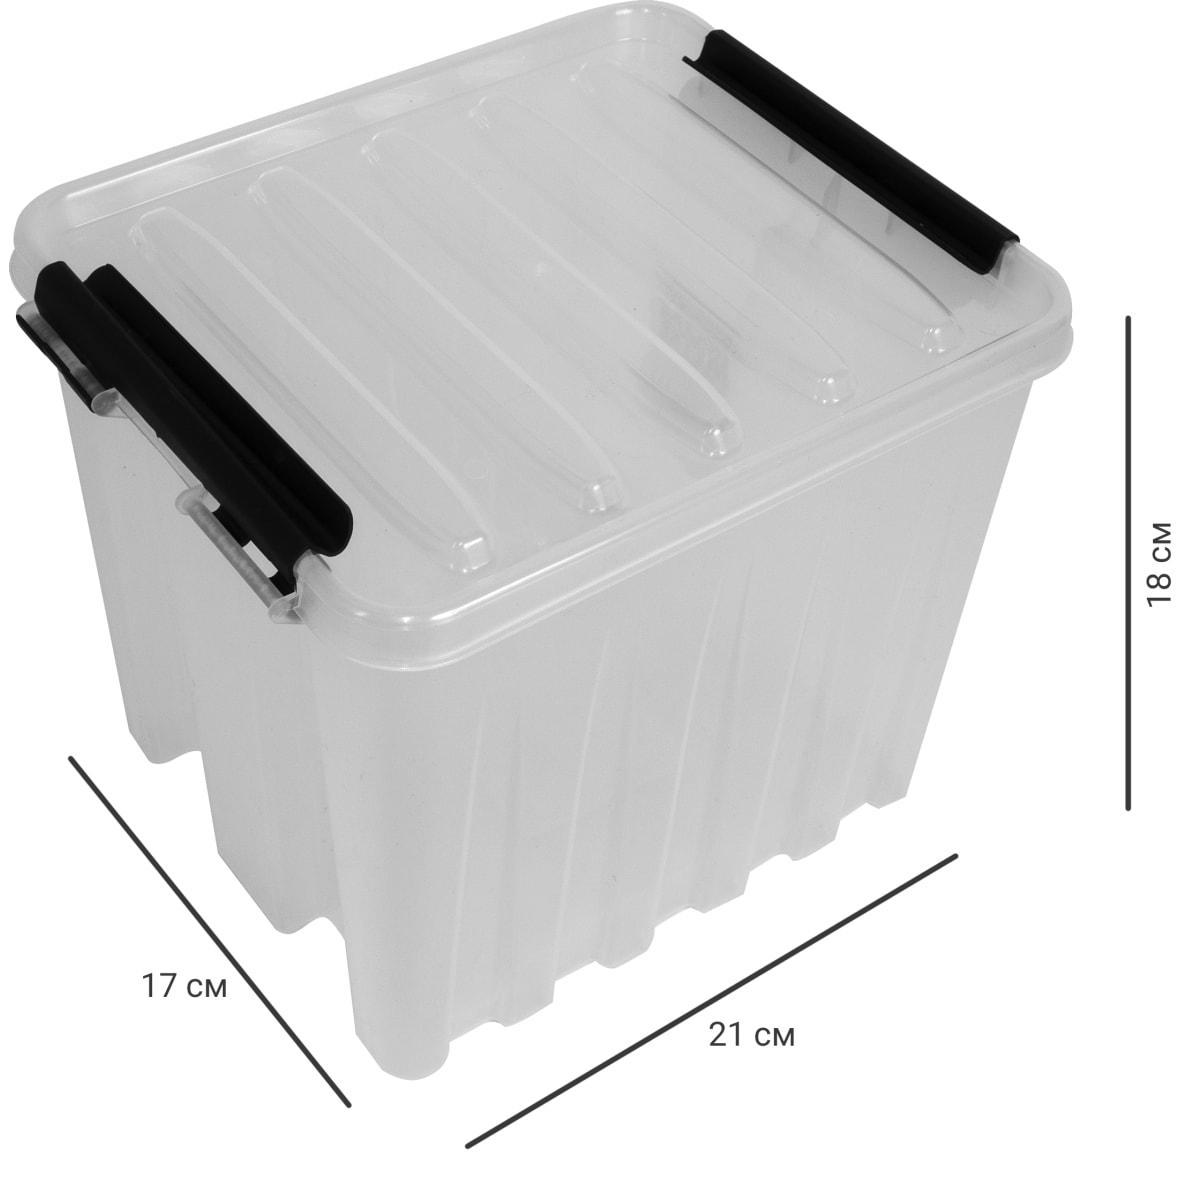 Контейнер Rox Box с крышкой 17x18x21 см, 4.5 л, пластик цвет прозрачный